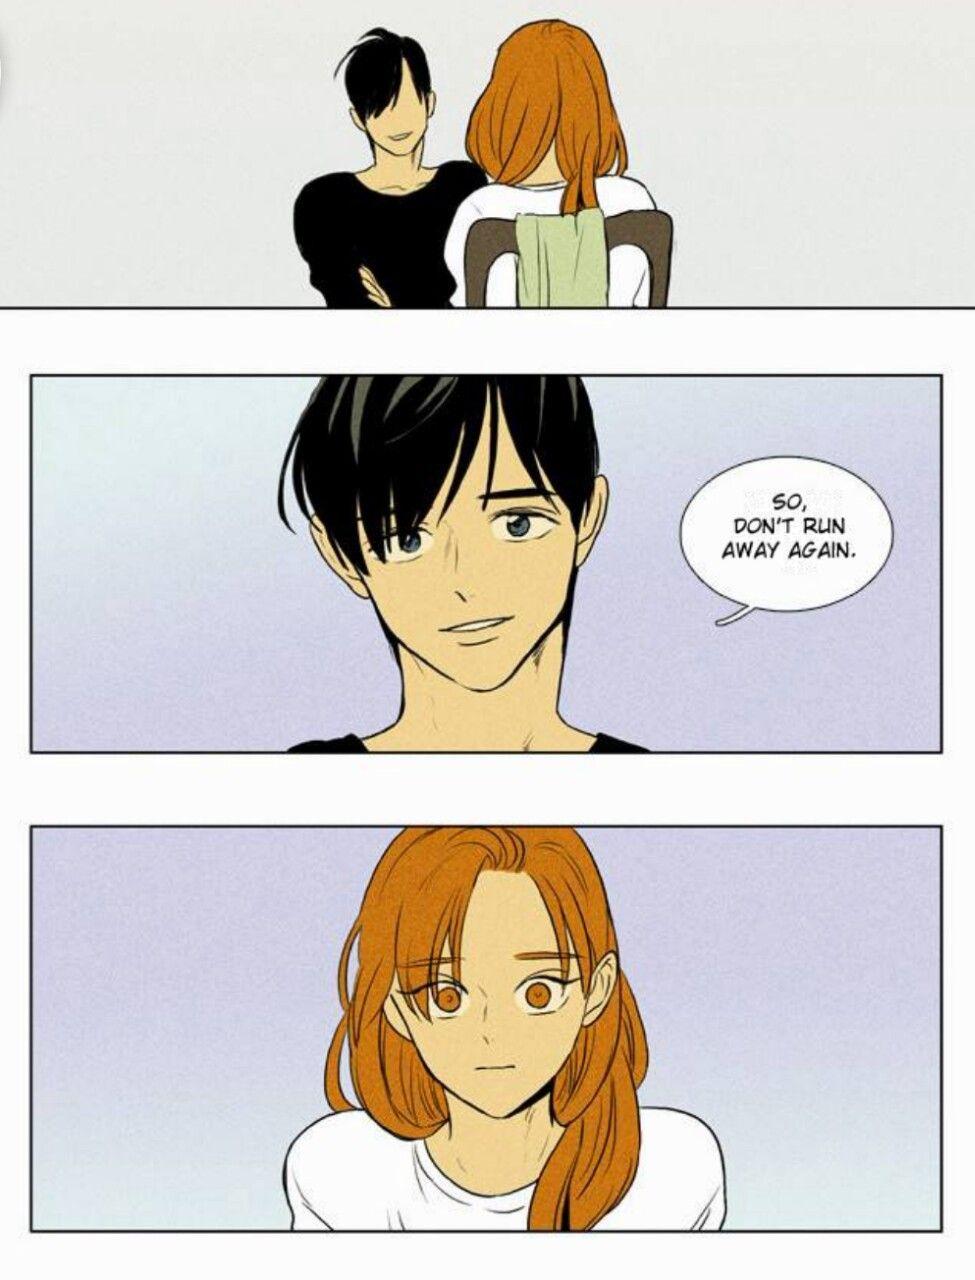 12 Amazing Korean Webtoons That You Should Be Reading